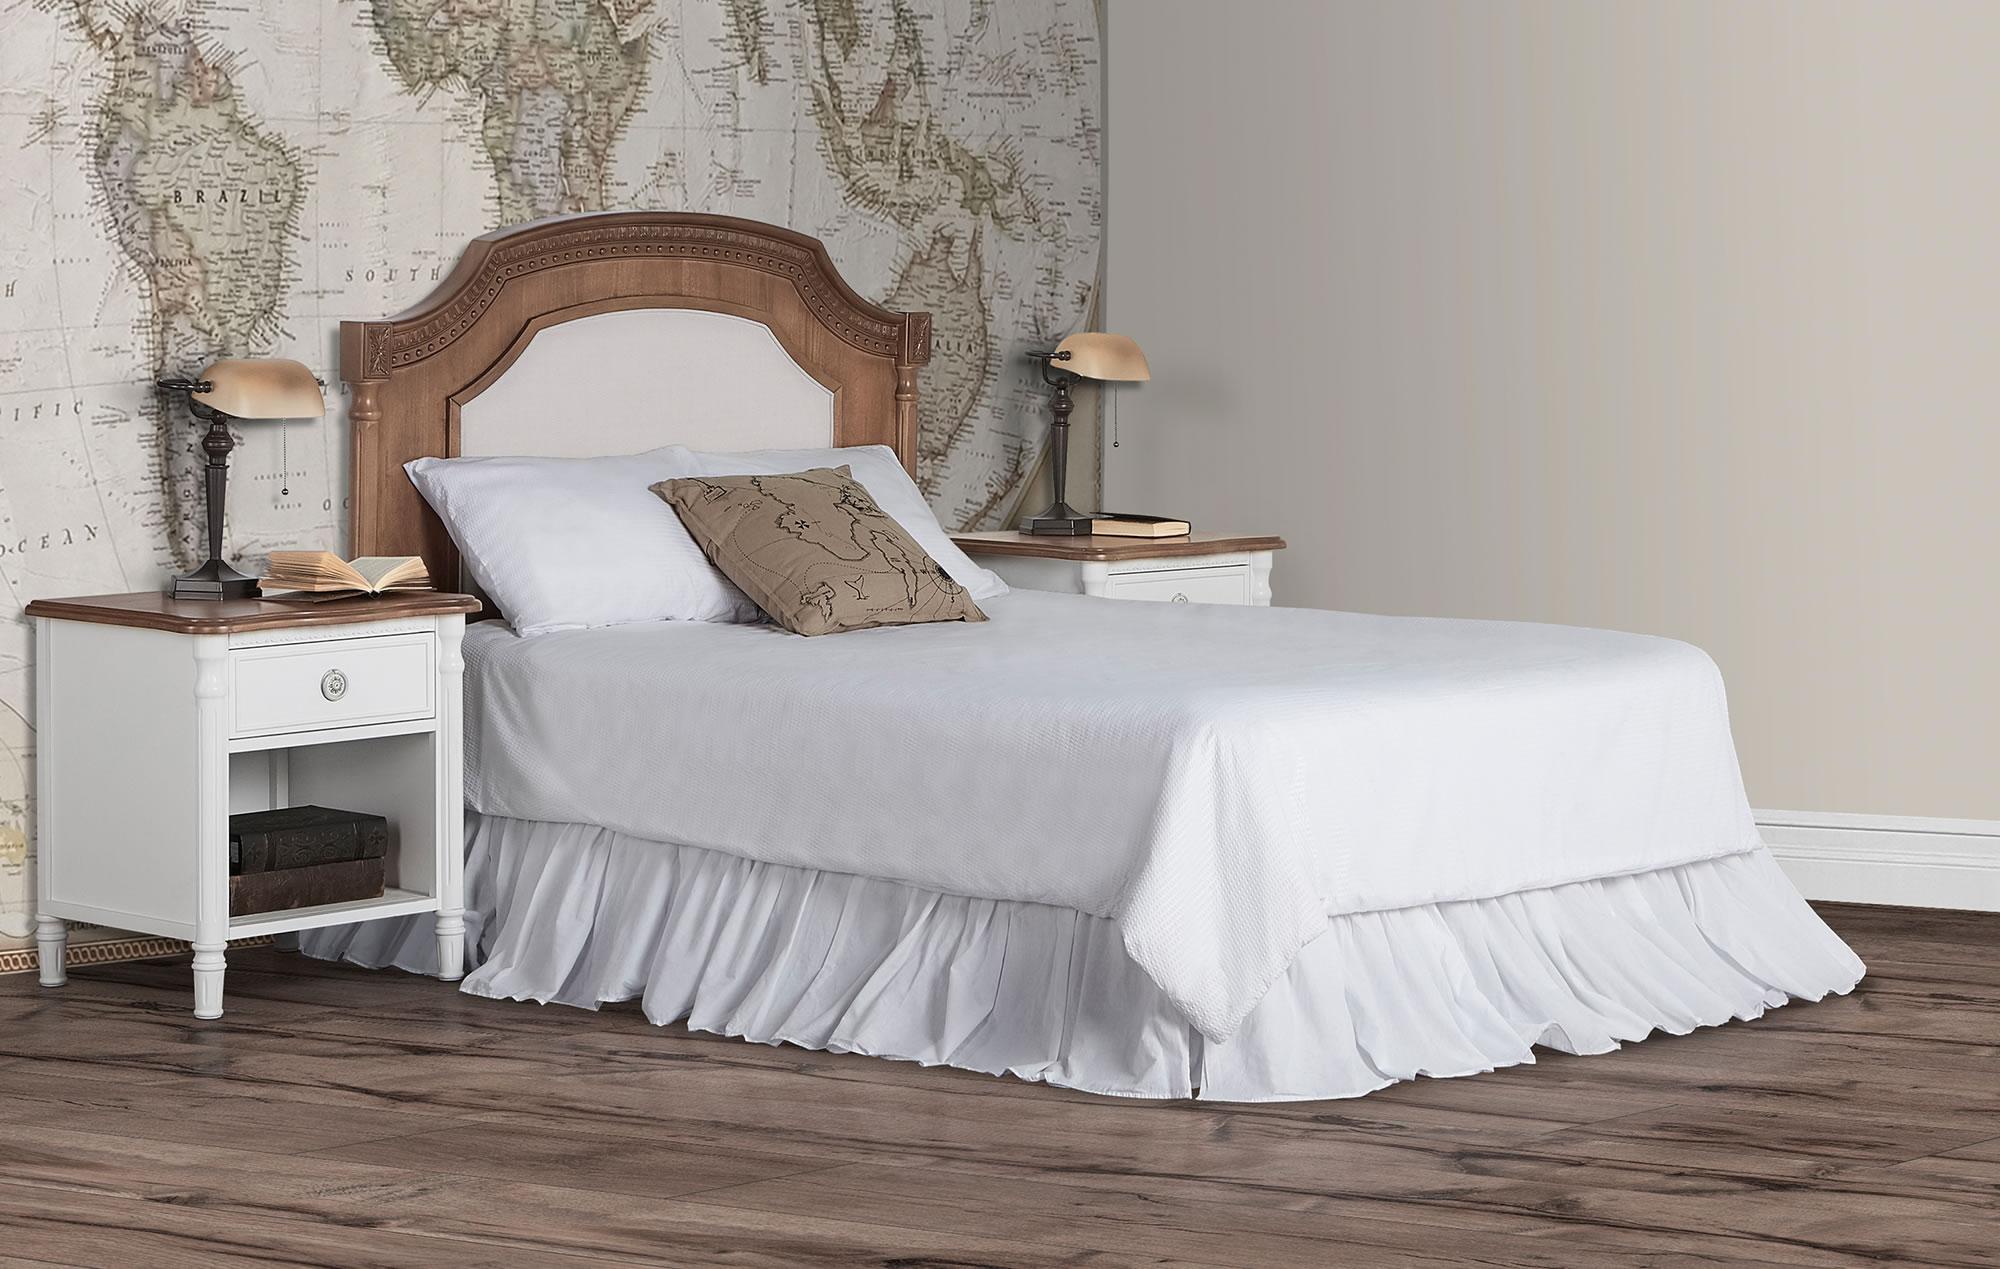 837-T Evolur Julienne Day Bed RS1